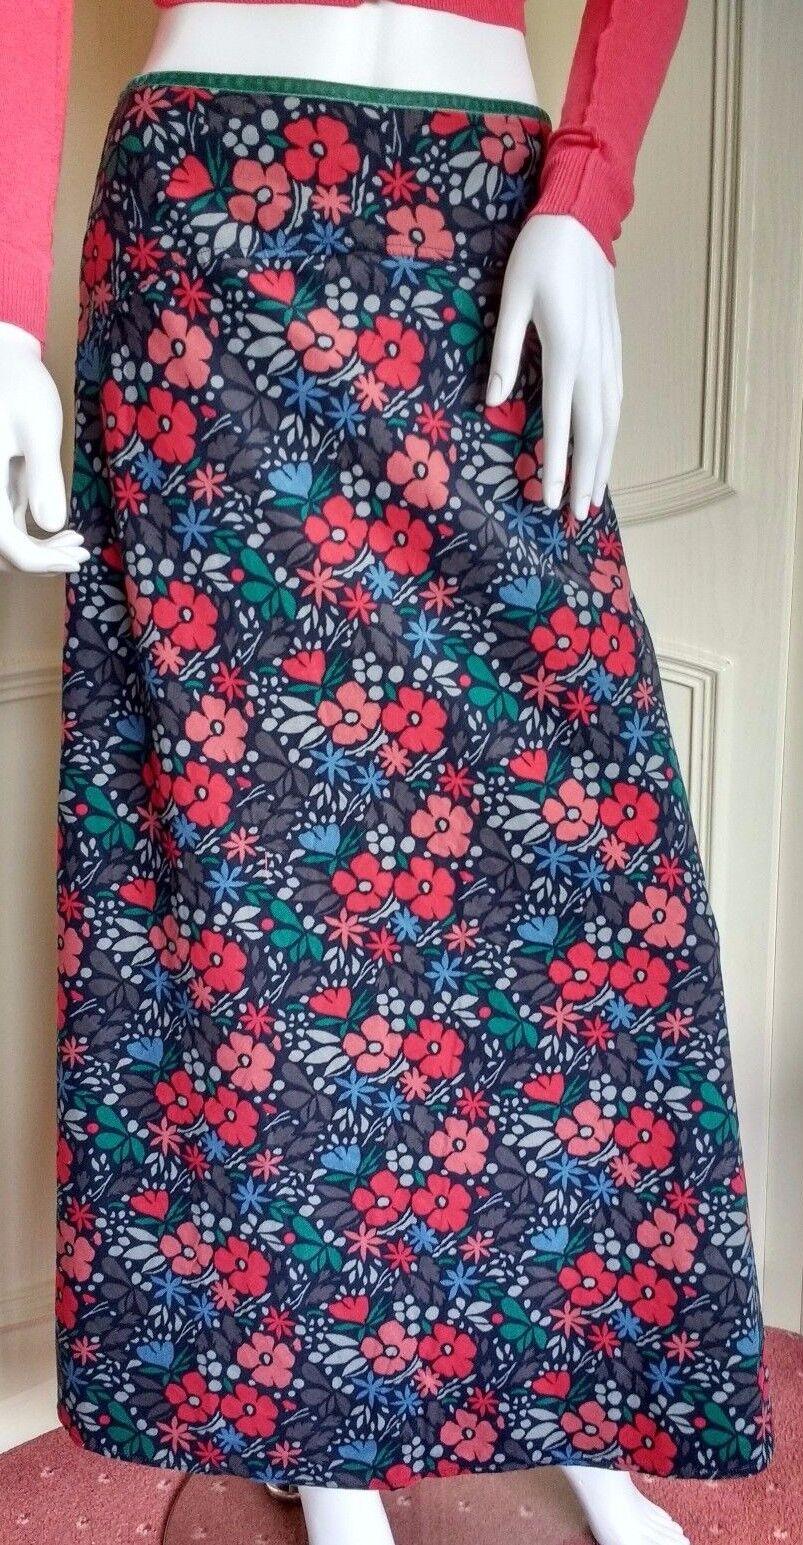 SEASALT Pentire Point Skirt Kaye's Floral Multi Maxi length Cord skirt RRP